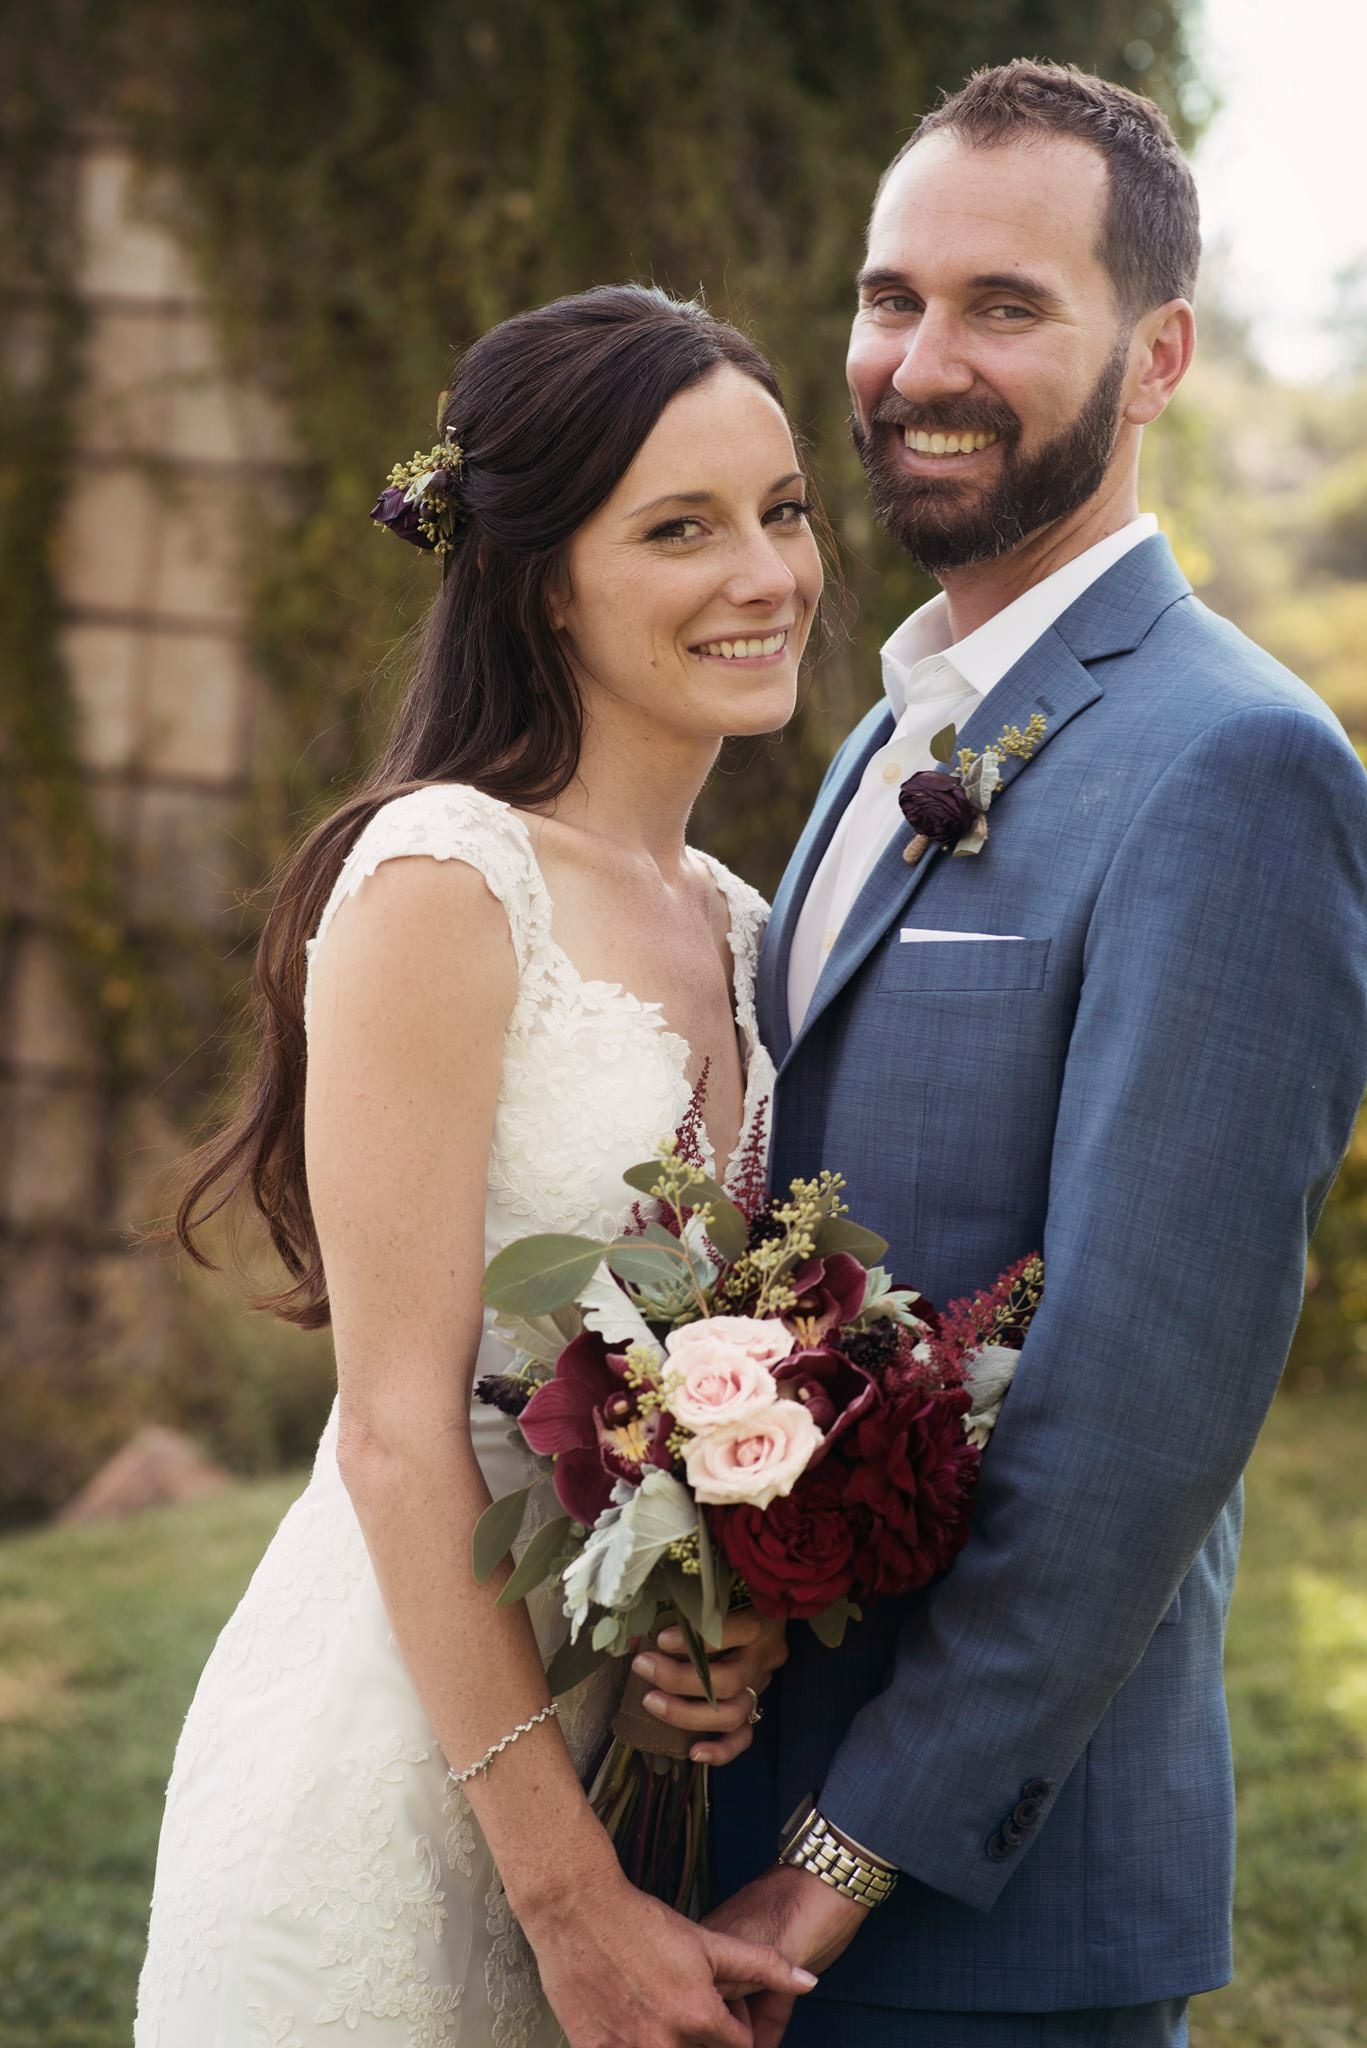 Denver-wedding-hairstylist-boho-bride